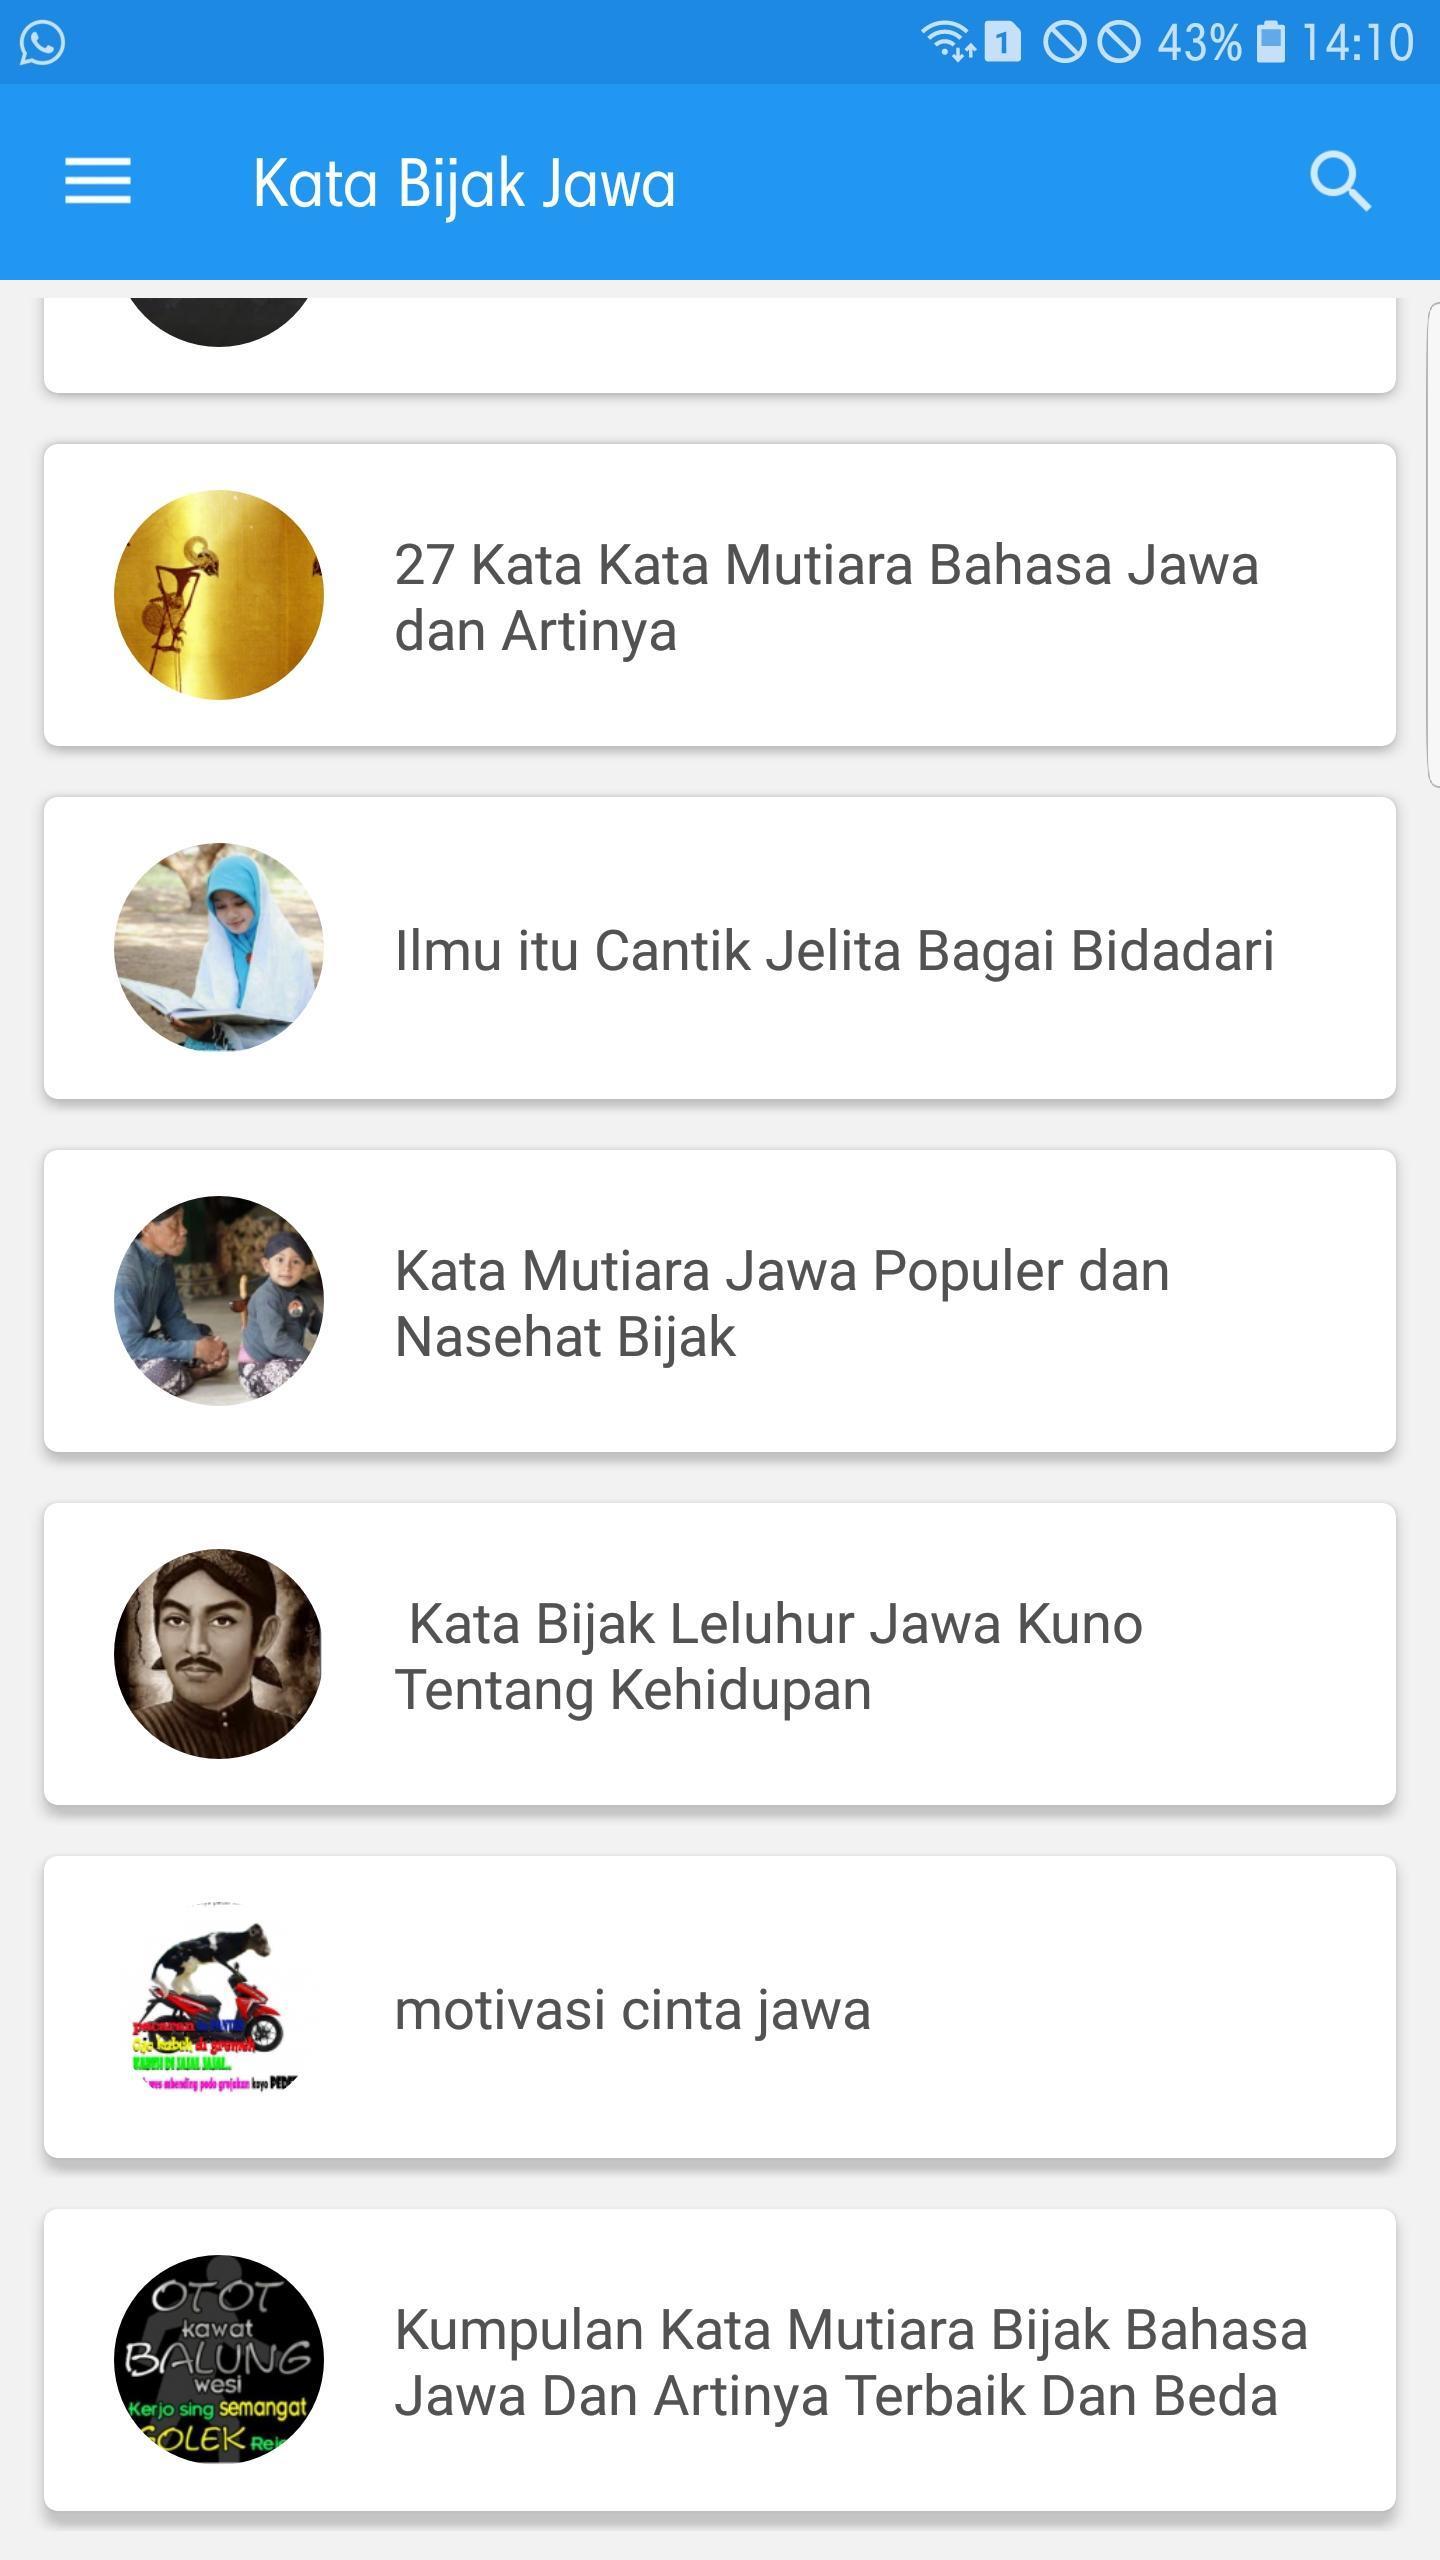 Kata Bijak Jawa For Android Apk Download